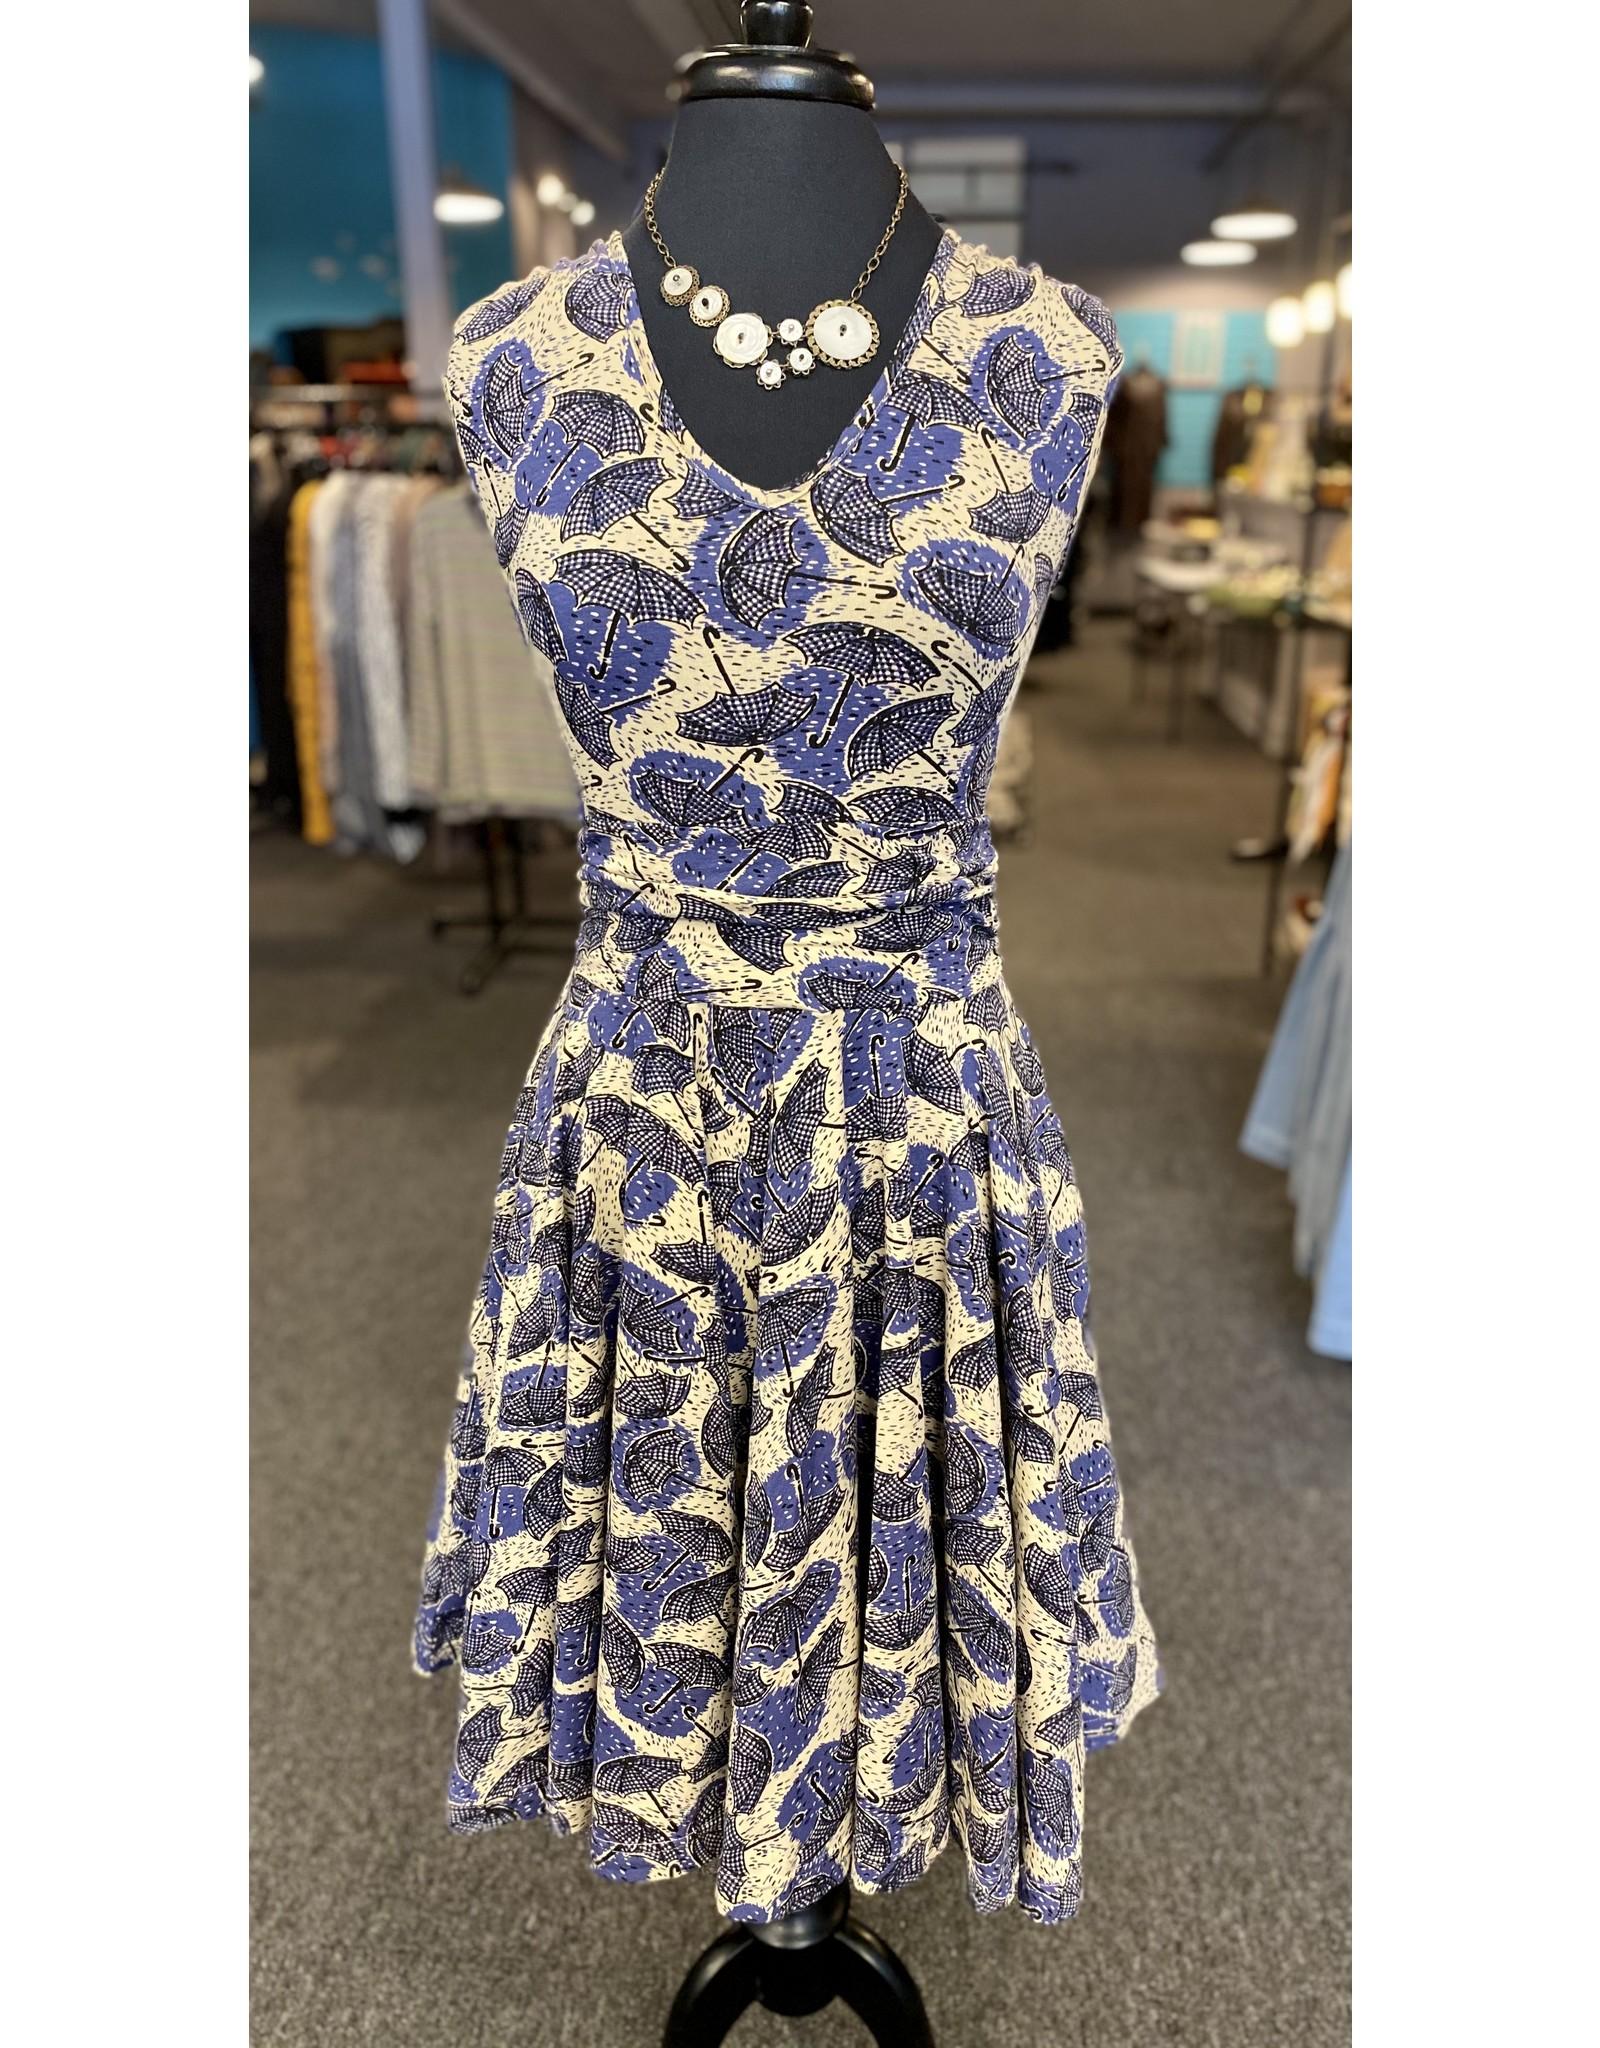 Effie's Heart Charming Dress